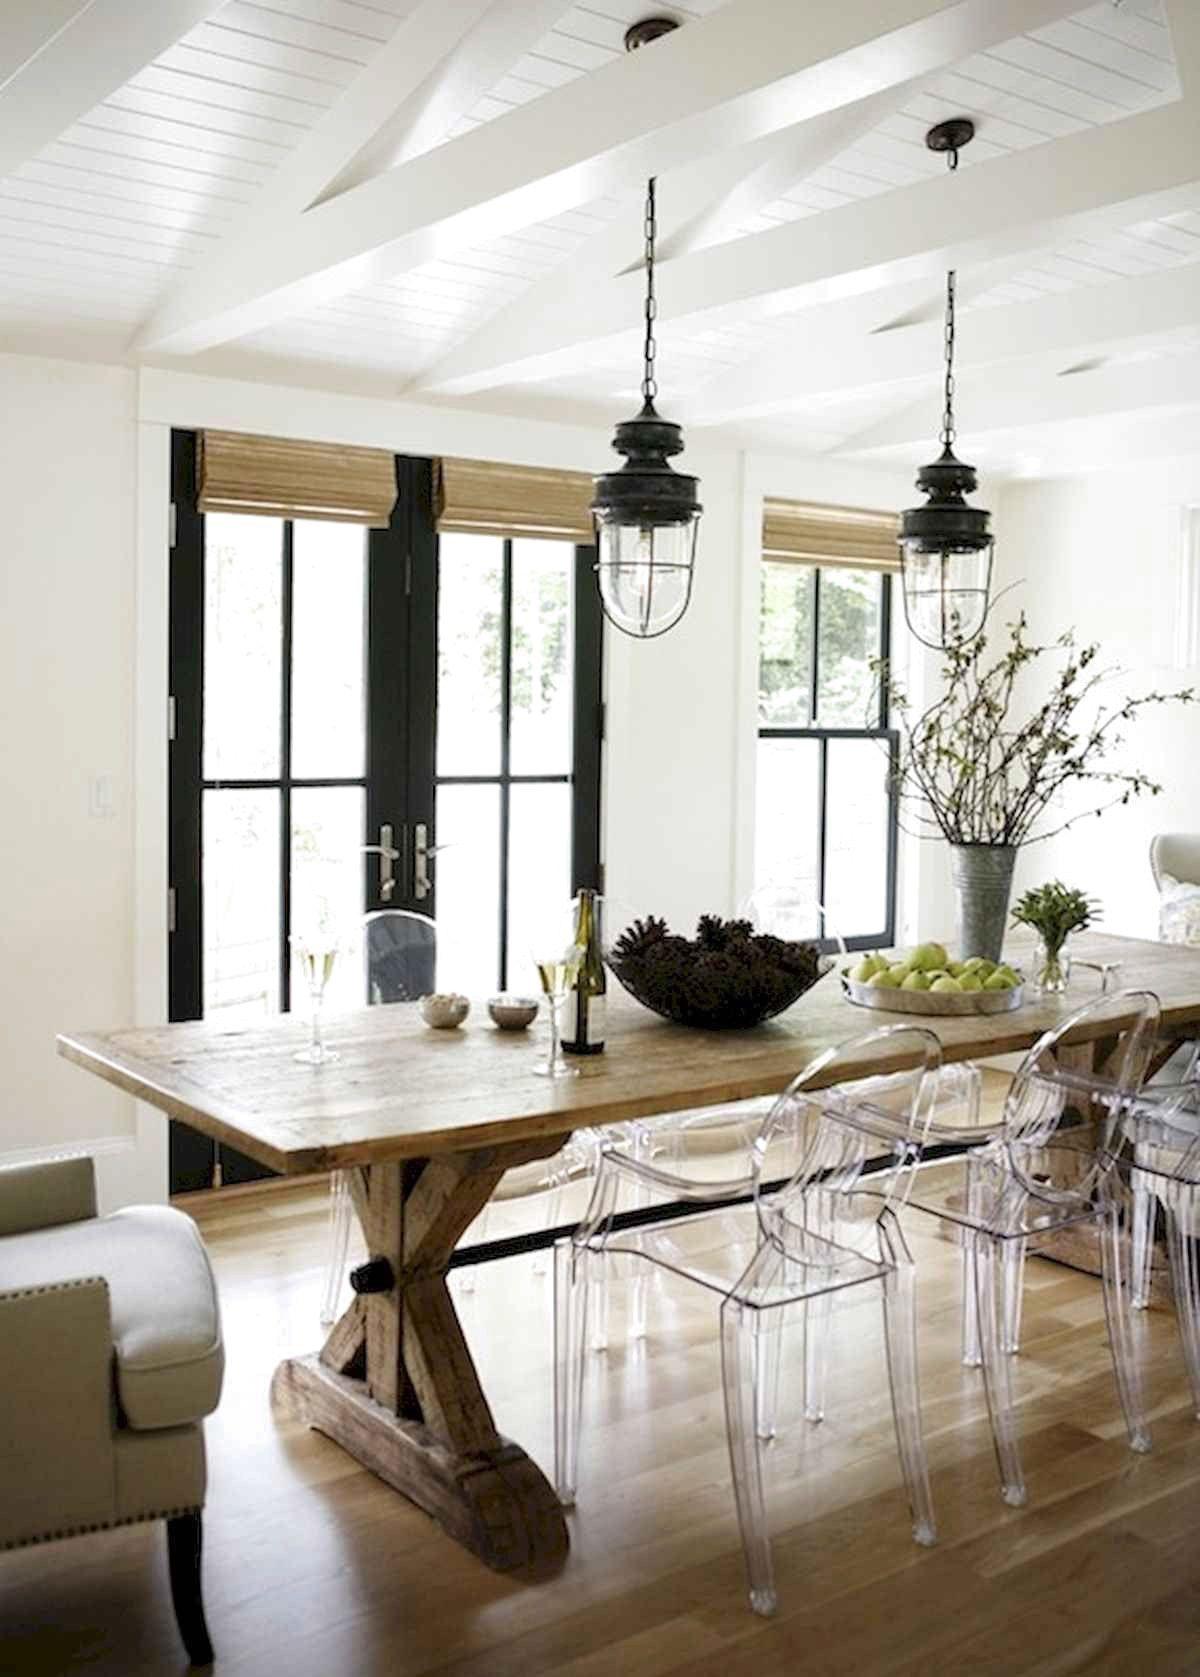 Modern Farmhouse Dining Room Table Ideas Decor And Makeover ...